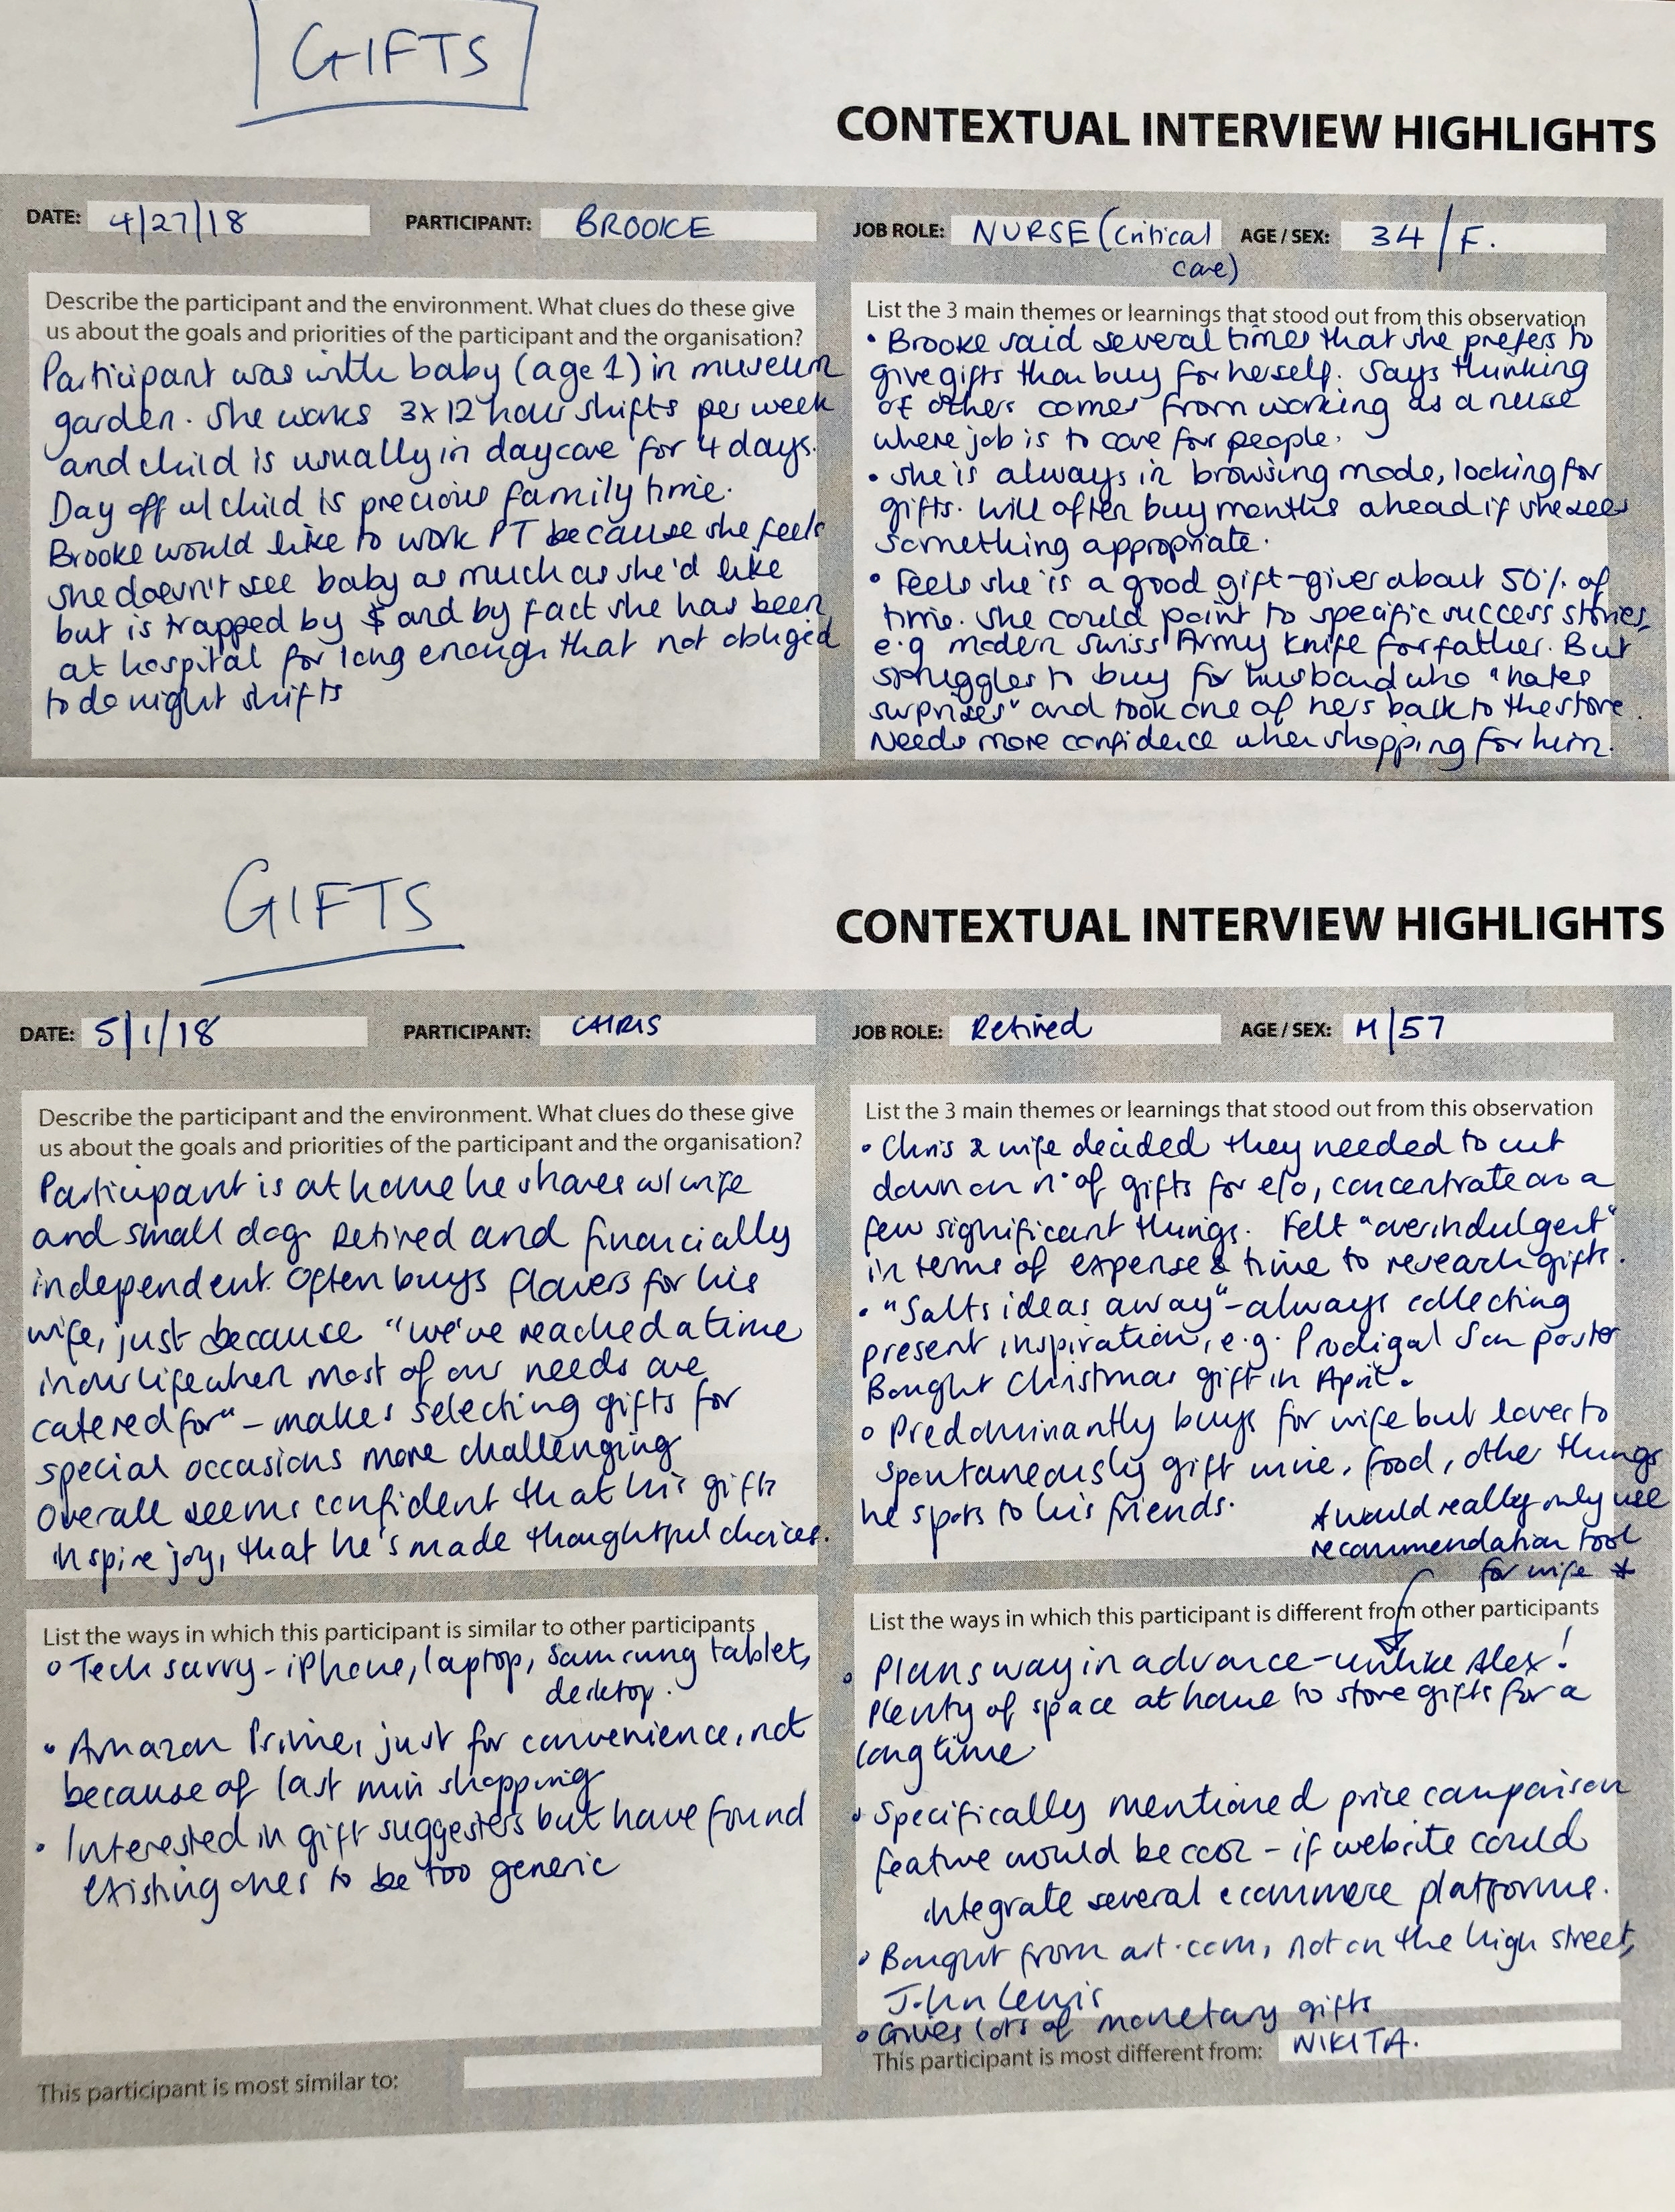 Summarizing key observations, comparing, contrasting